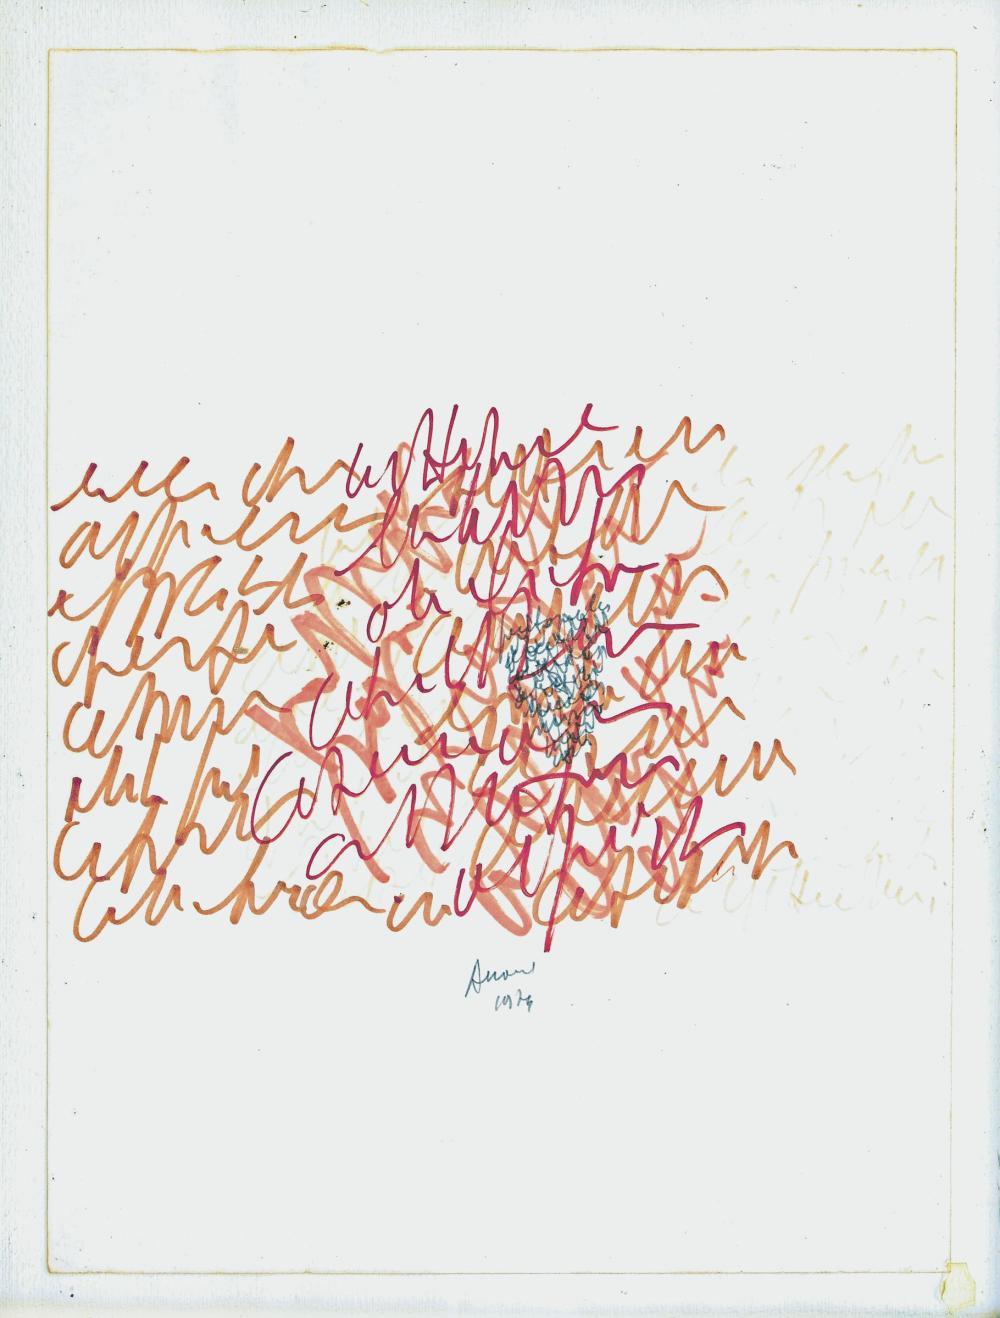 Vincenzo Accame (1932 - 1999), Alfabeto, 1974